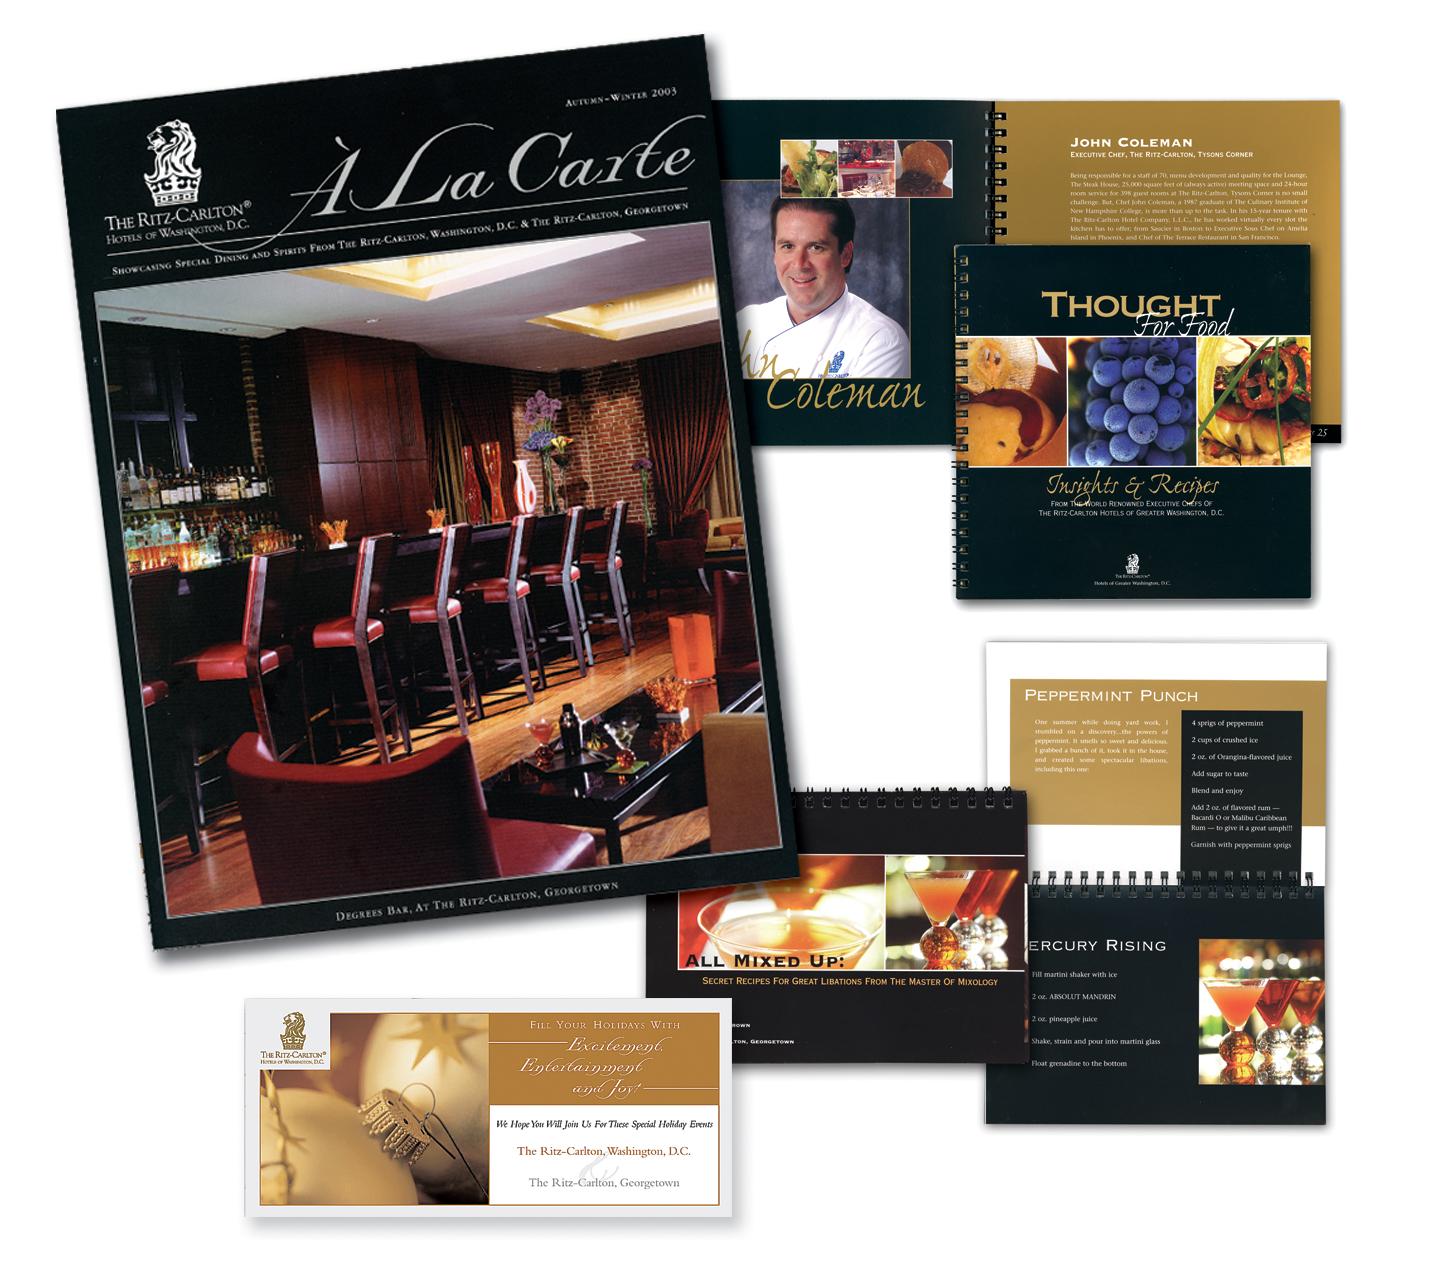 The Ritz-Carlton Hotels of D.C. Food & Beverage DM